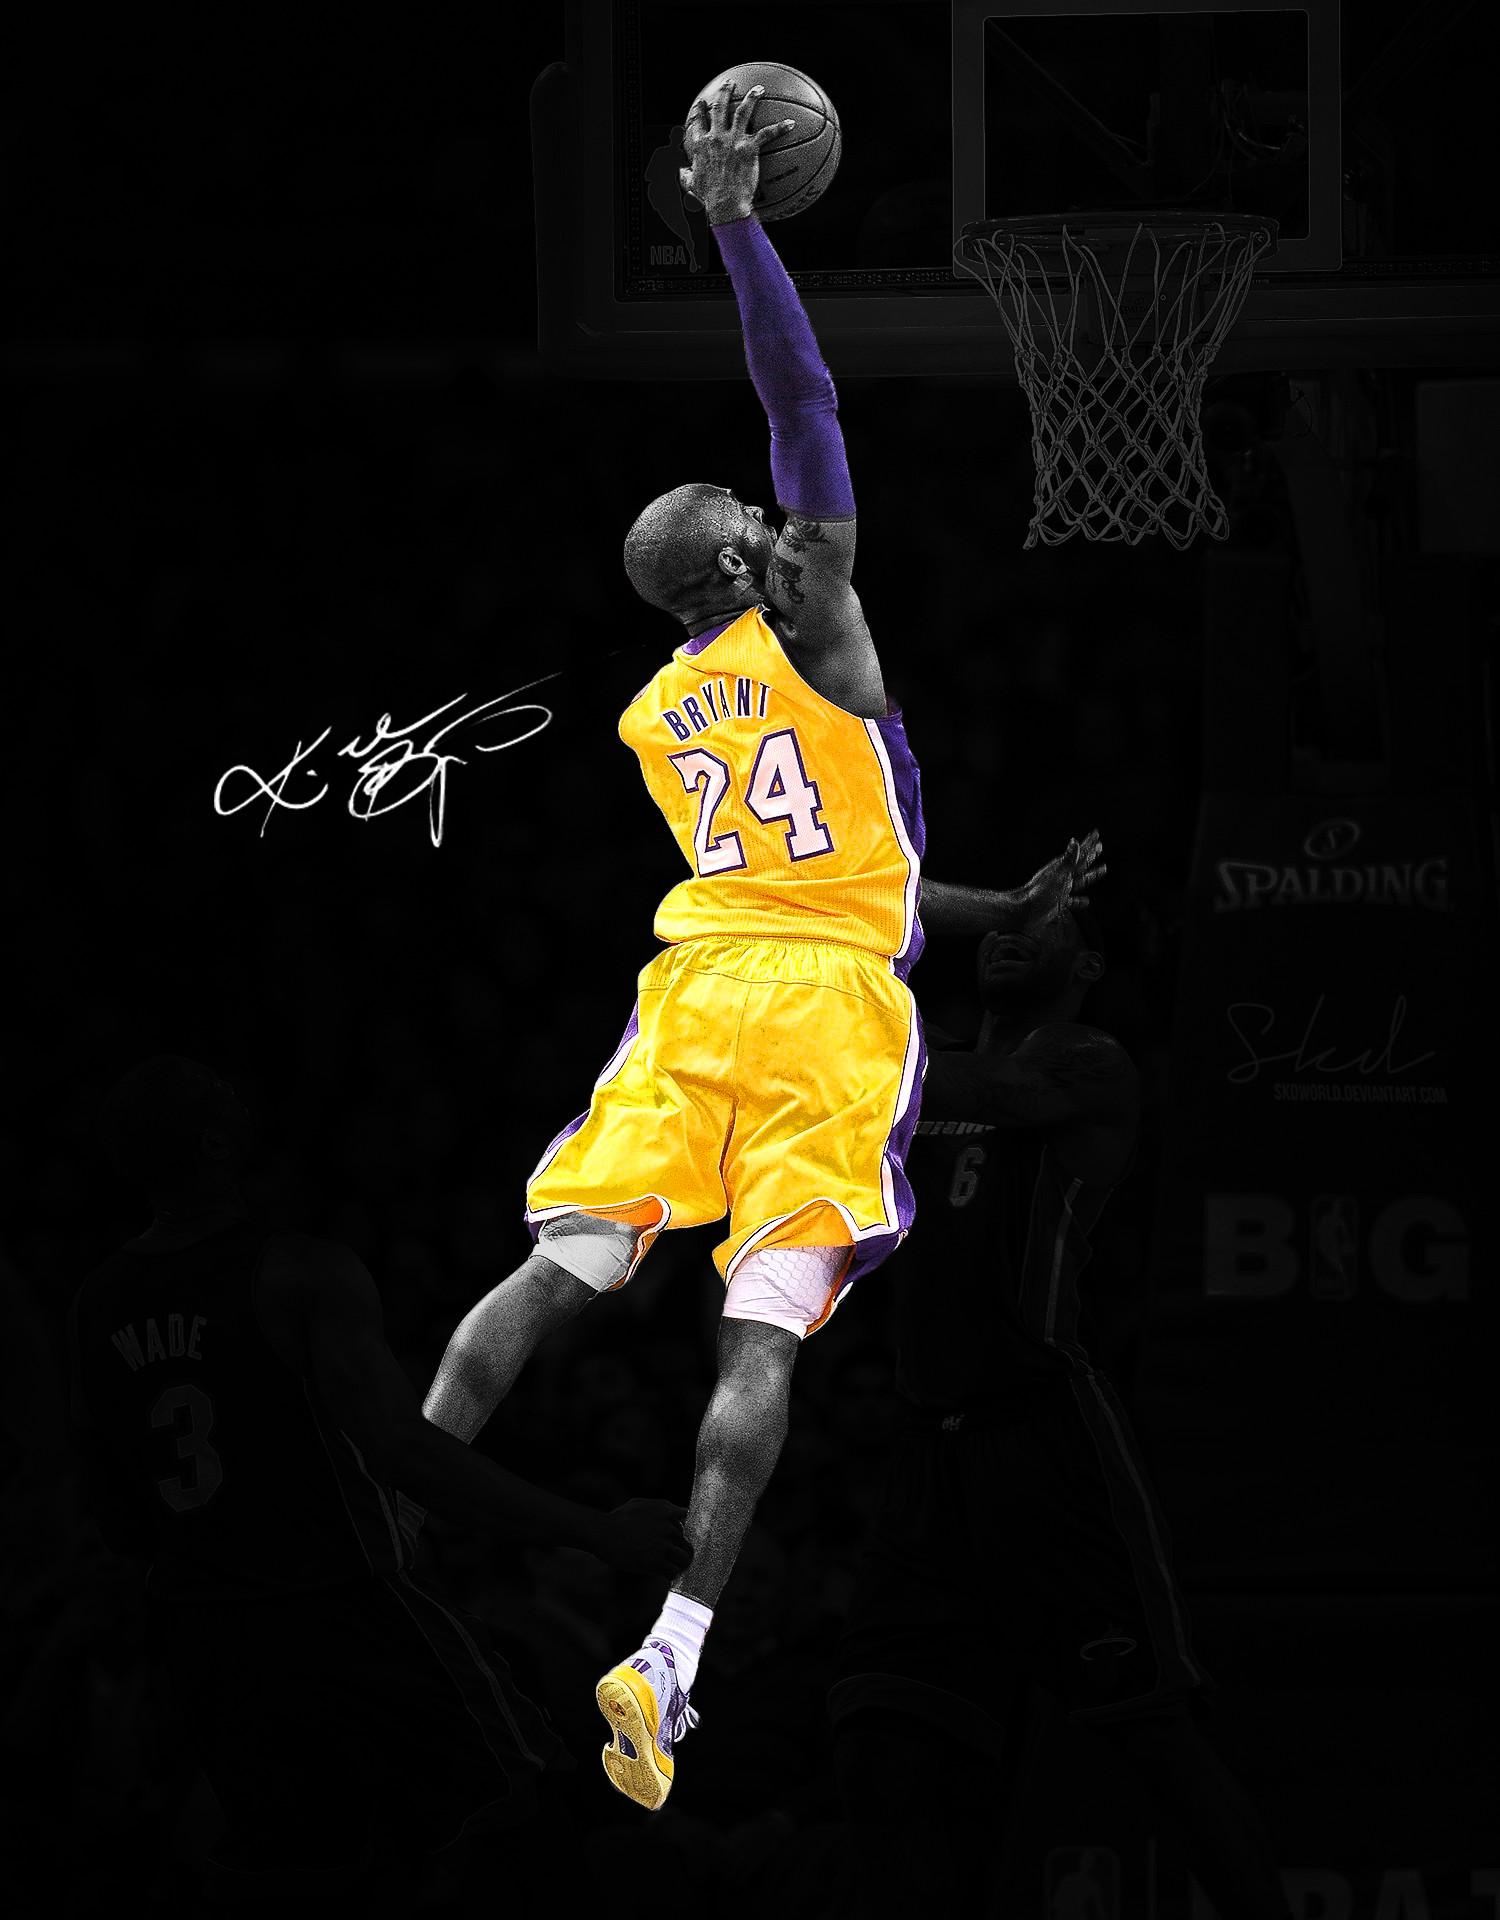 Nike kobe wallpaper wallpapertag - Iphone 4 basketball wallpaper ...